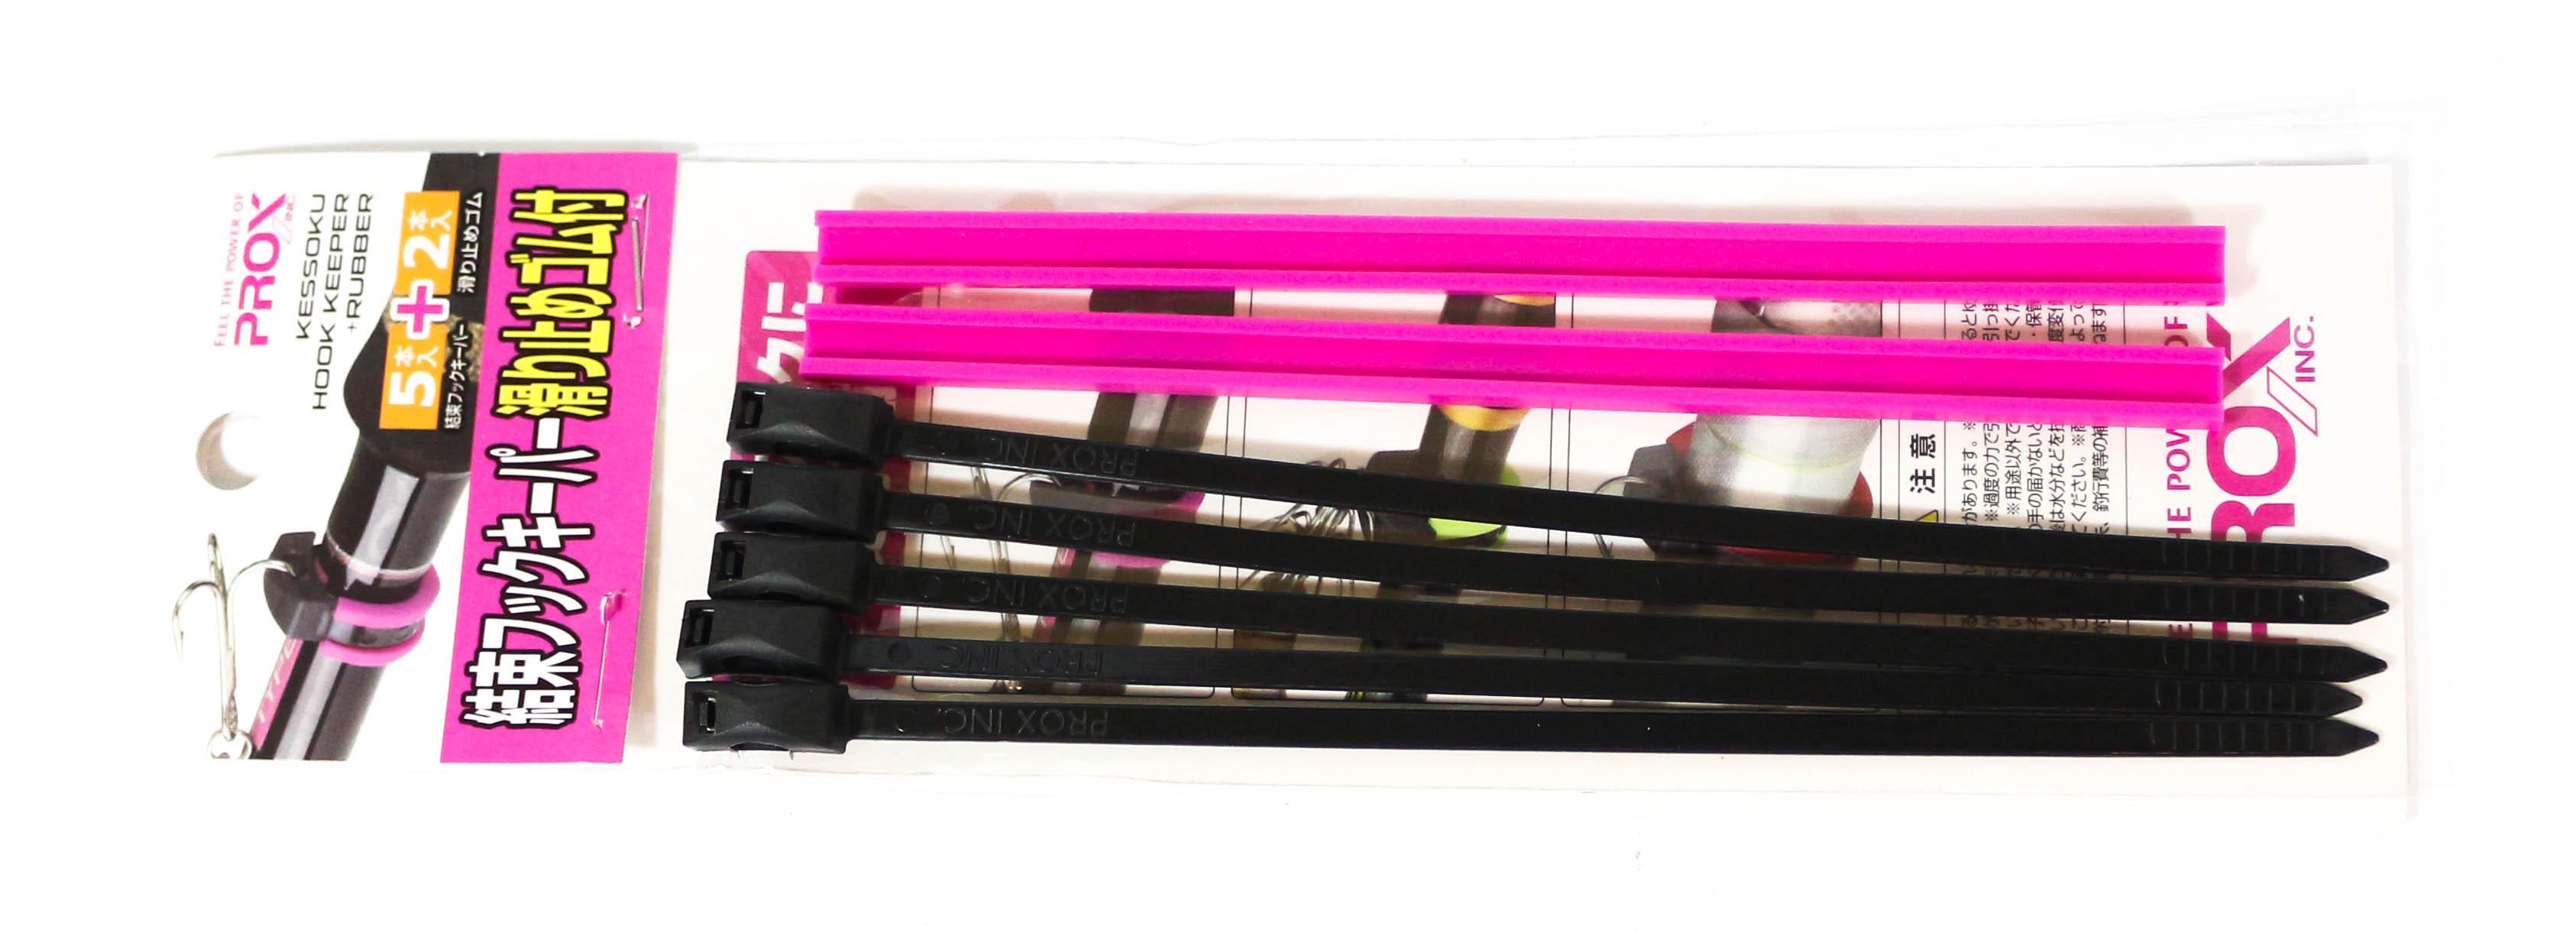 0732 Prox PX 90880 Hook File Sharpener 82 x 15 mm